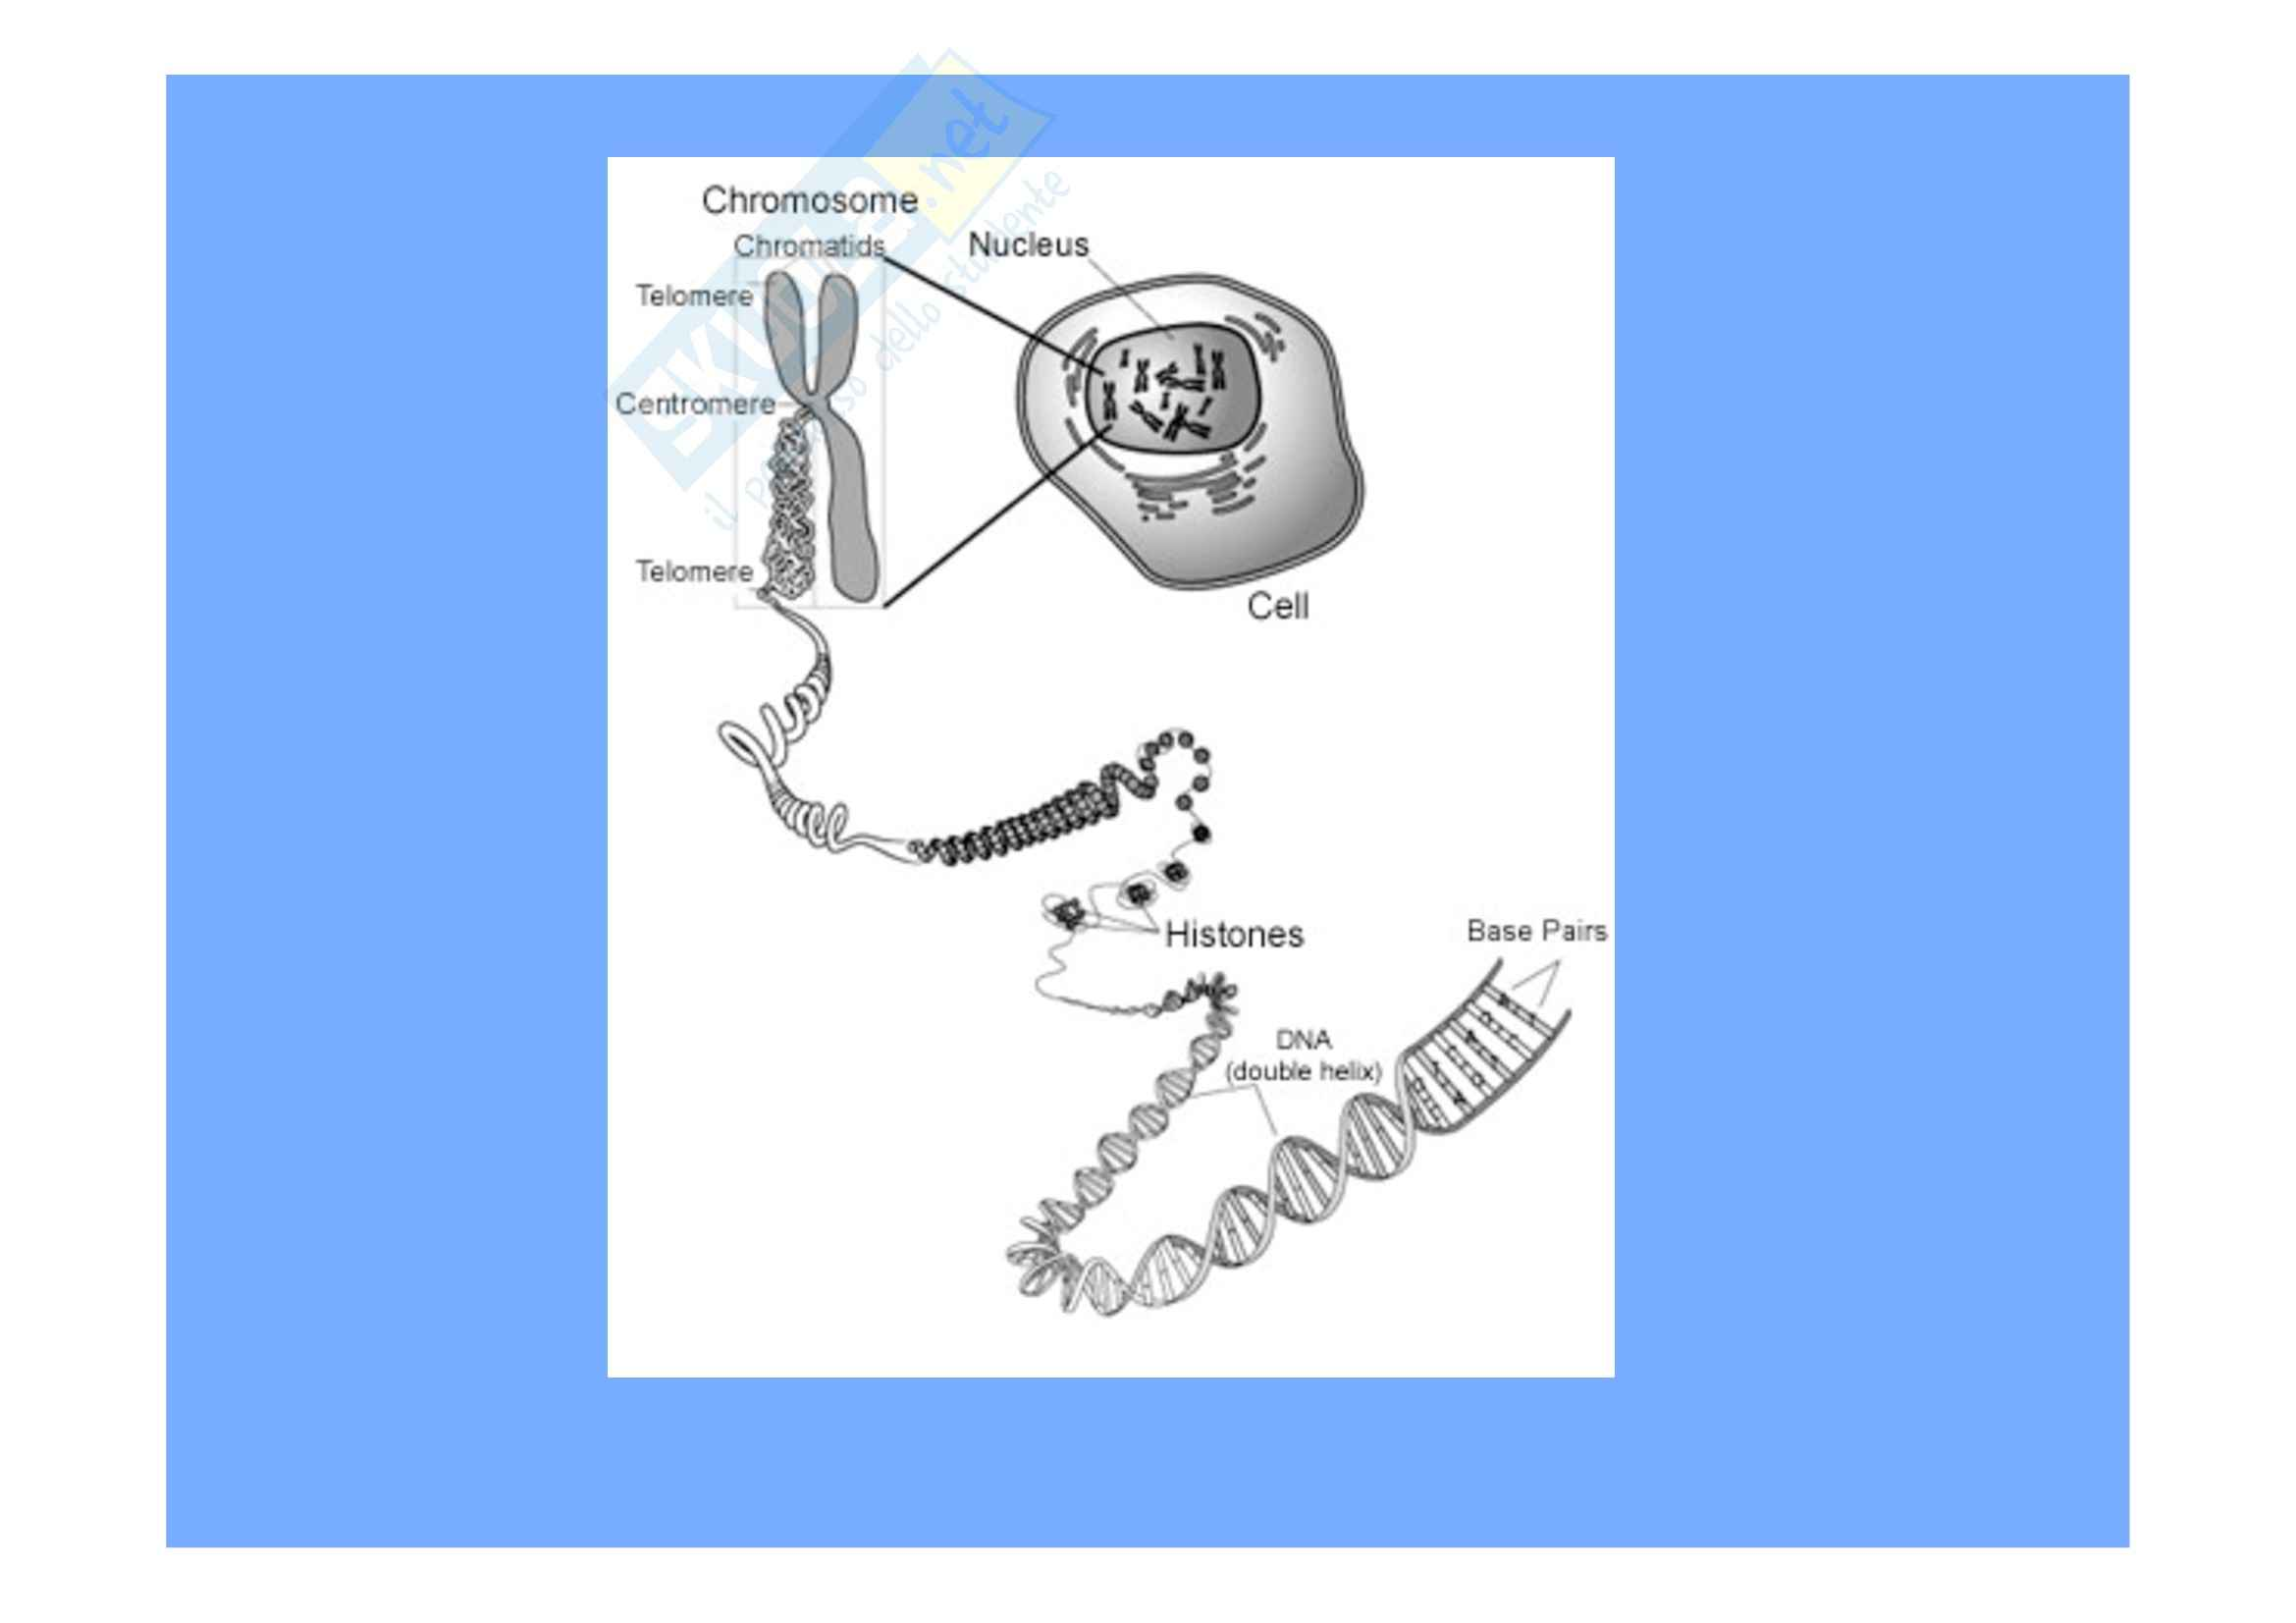 Genetica umana - cromosomopatie - Appunti